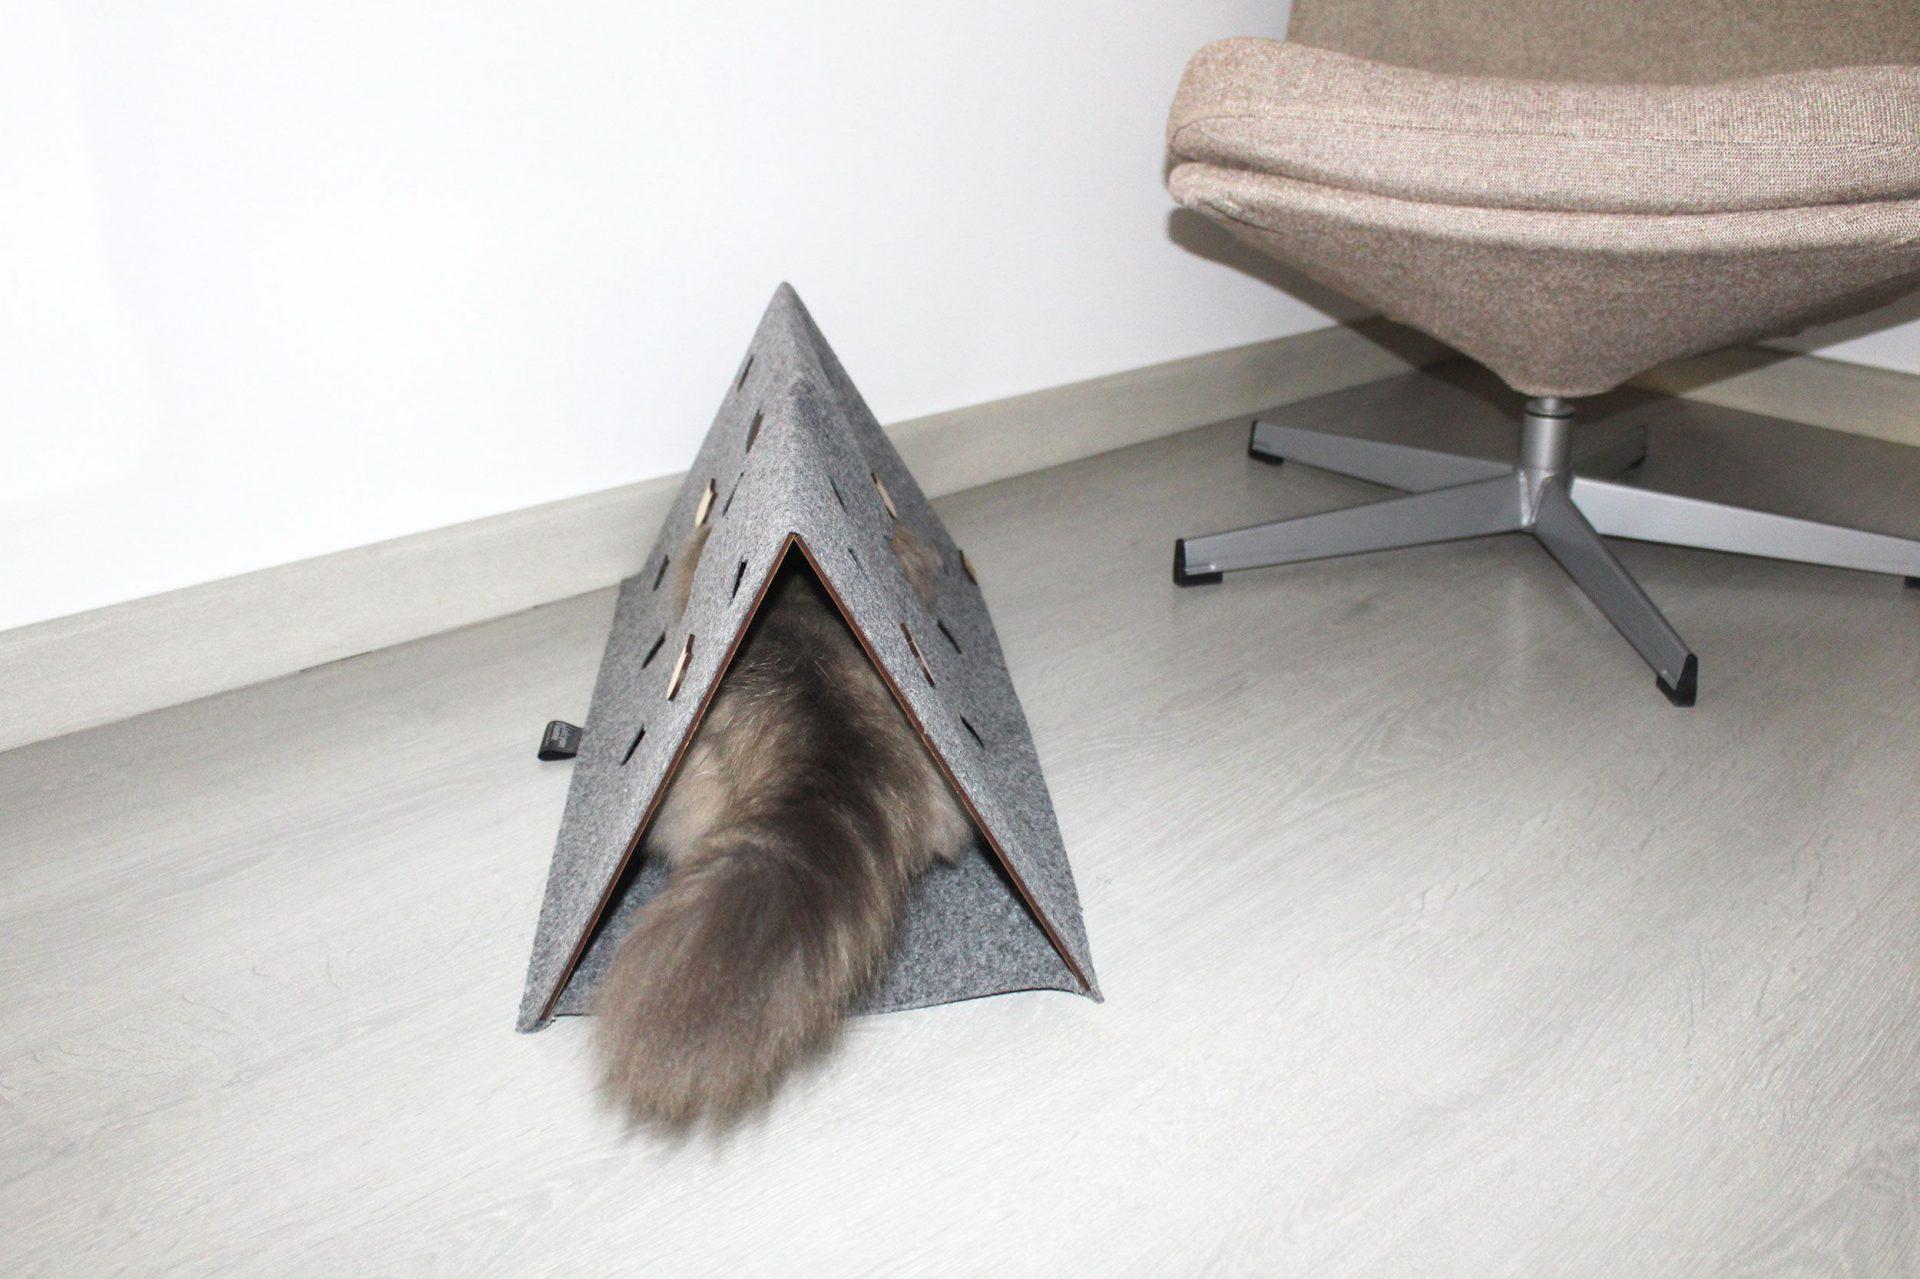 Escondite para gatos plegable